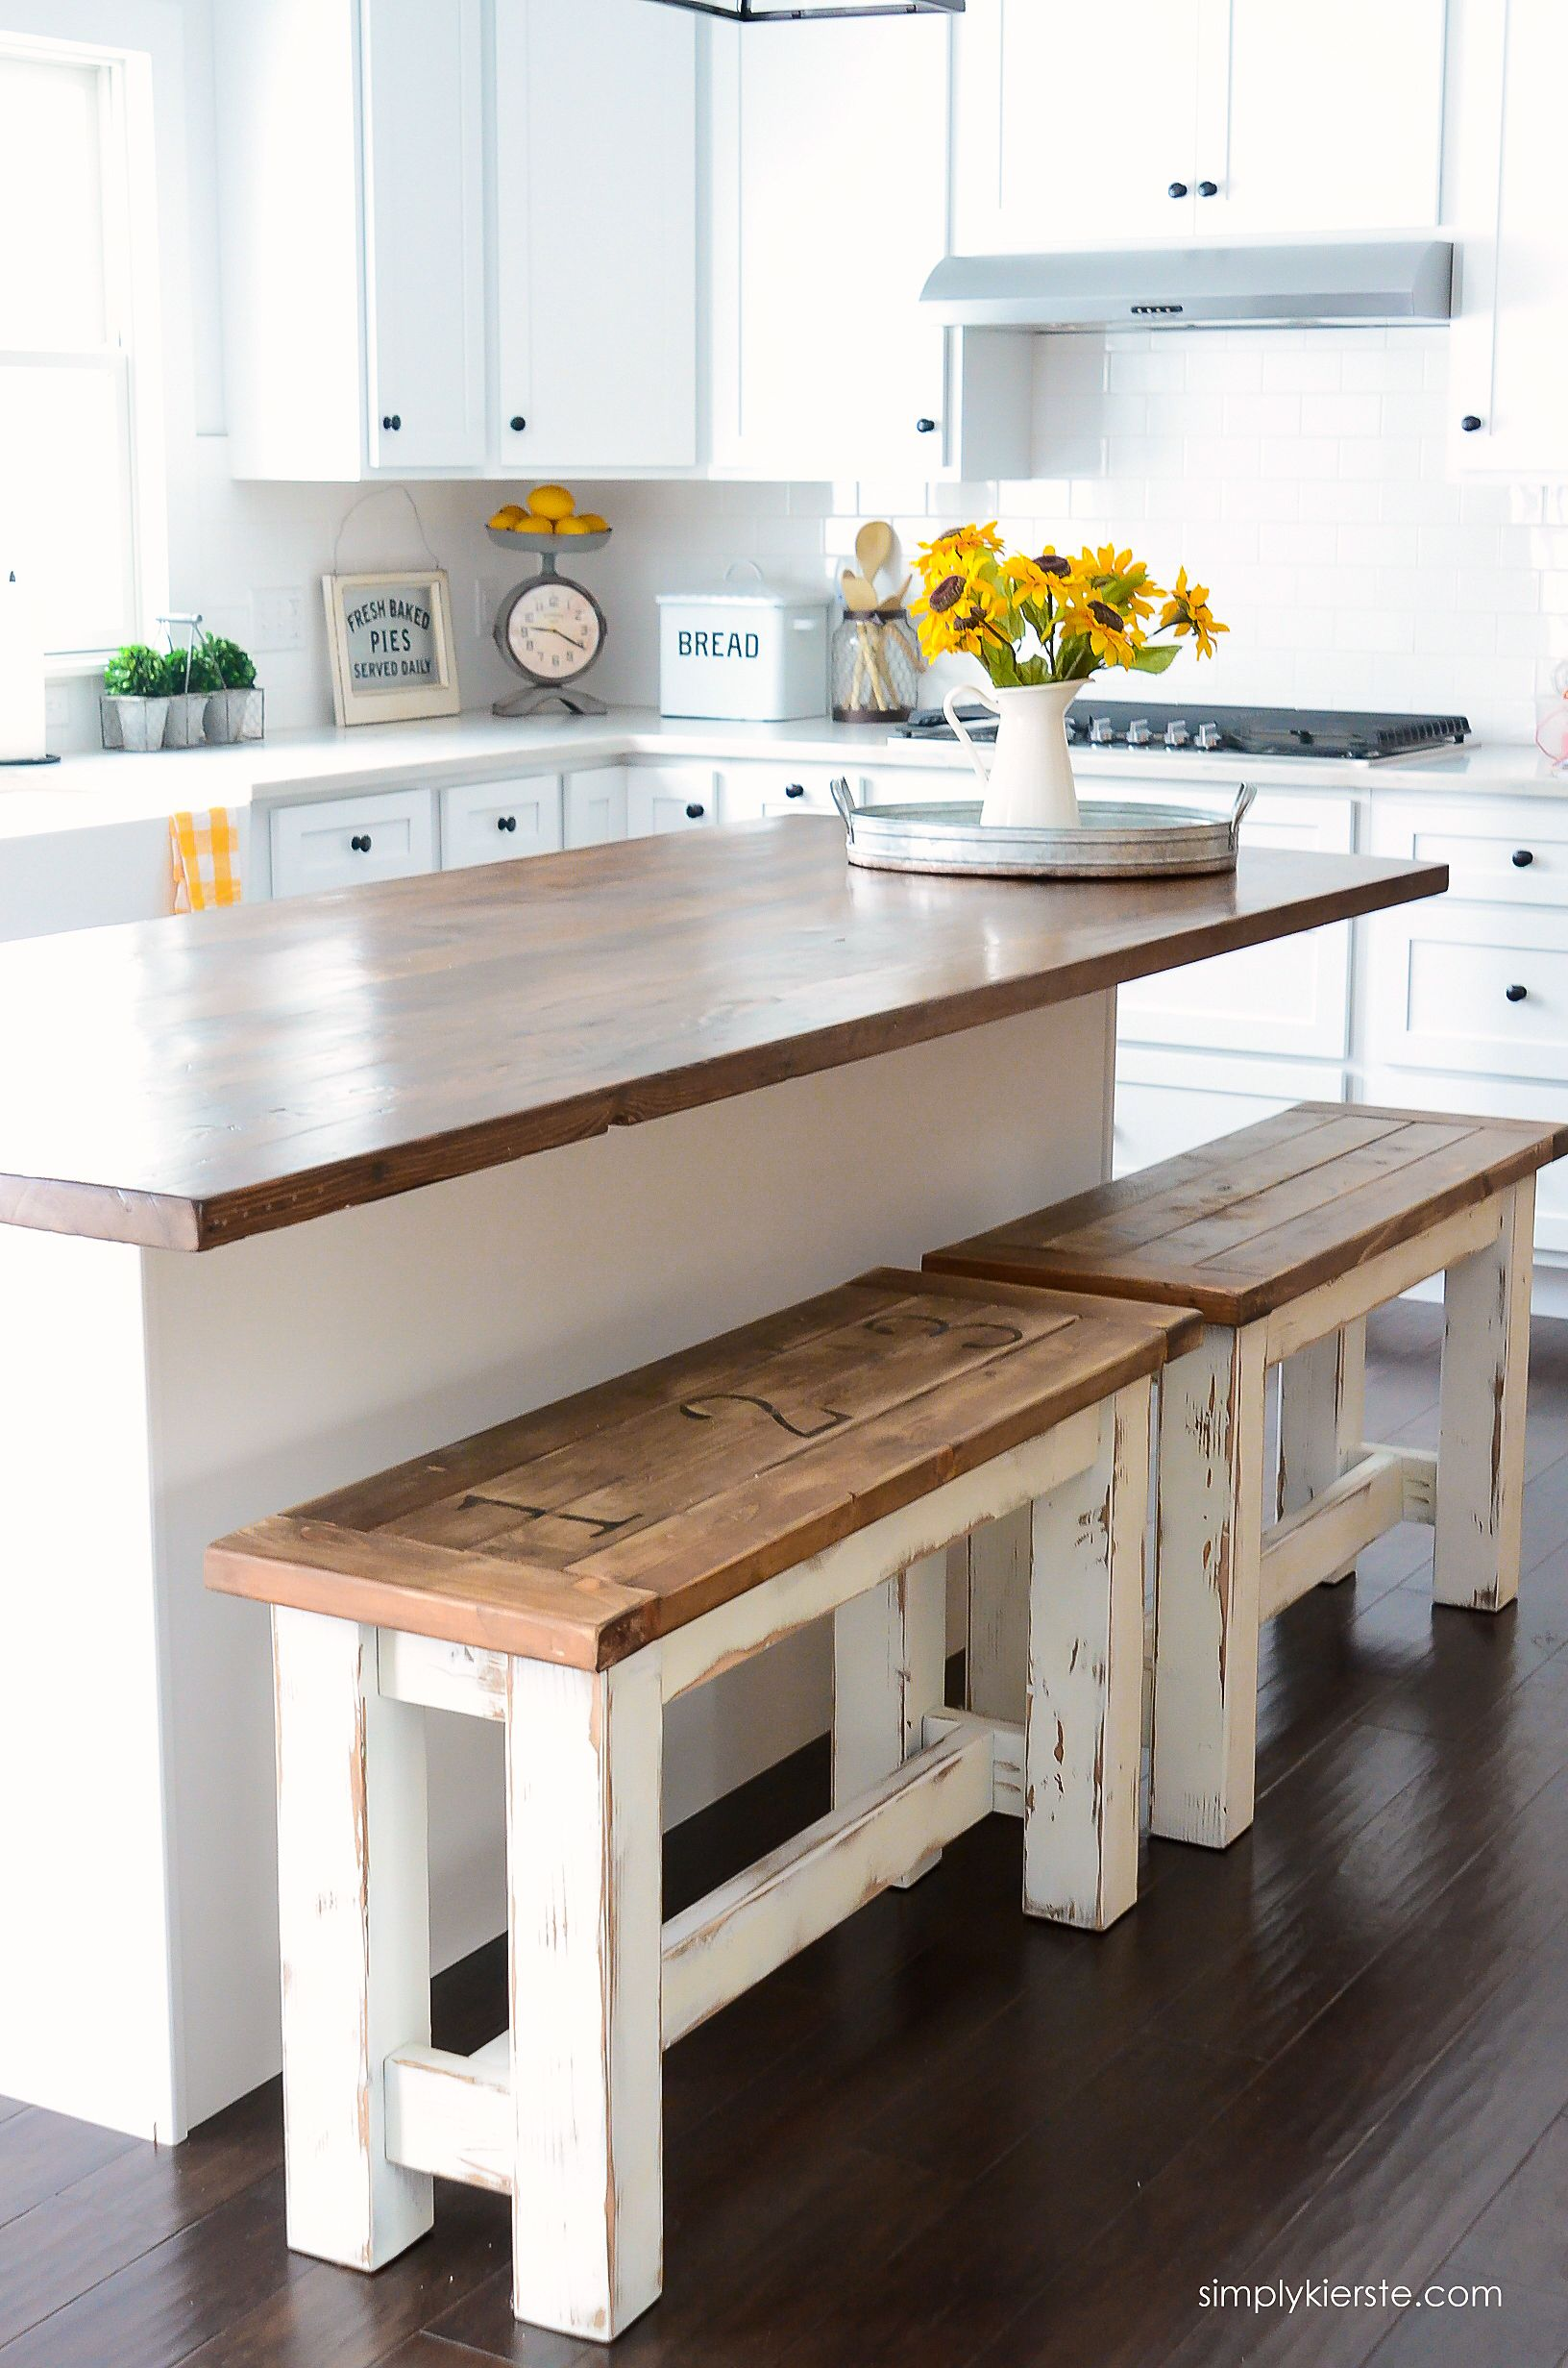 DIY Kitchen Benches  Indoors  Farmhouse style kitchen